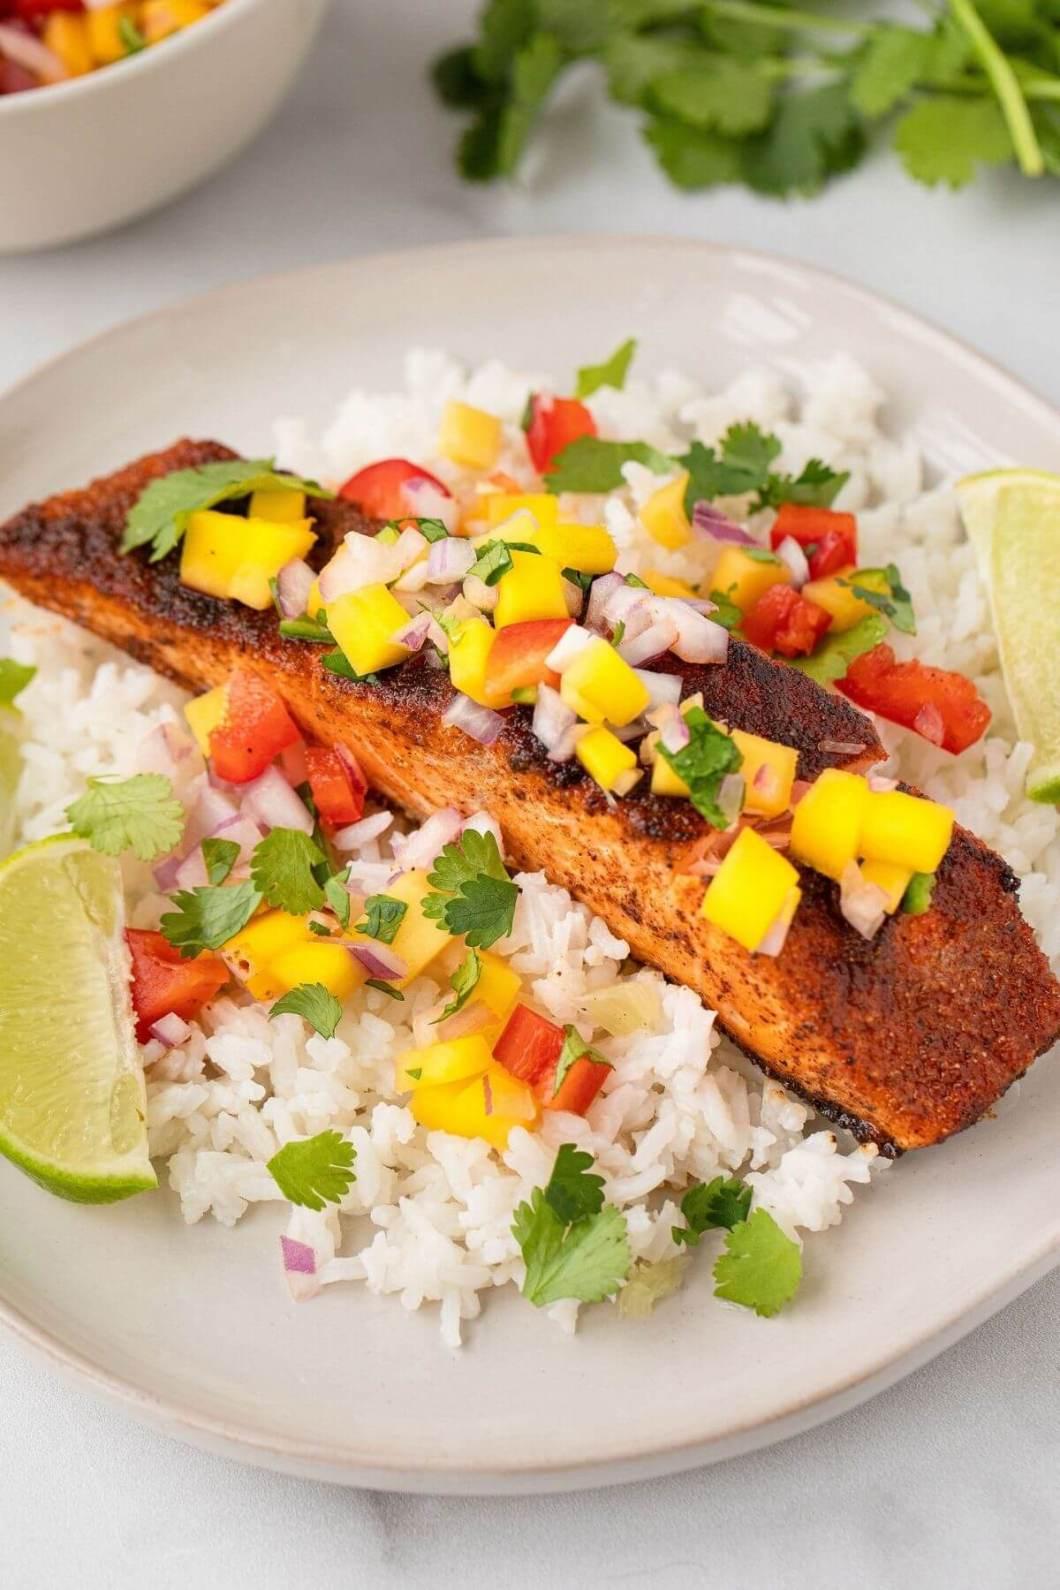 pan seared blackened salmon on rice with fresh mango salsa on top